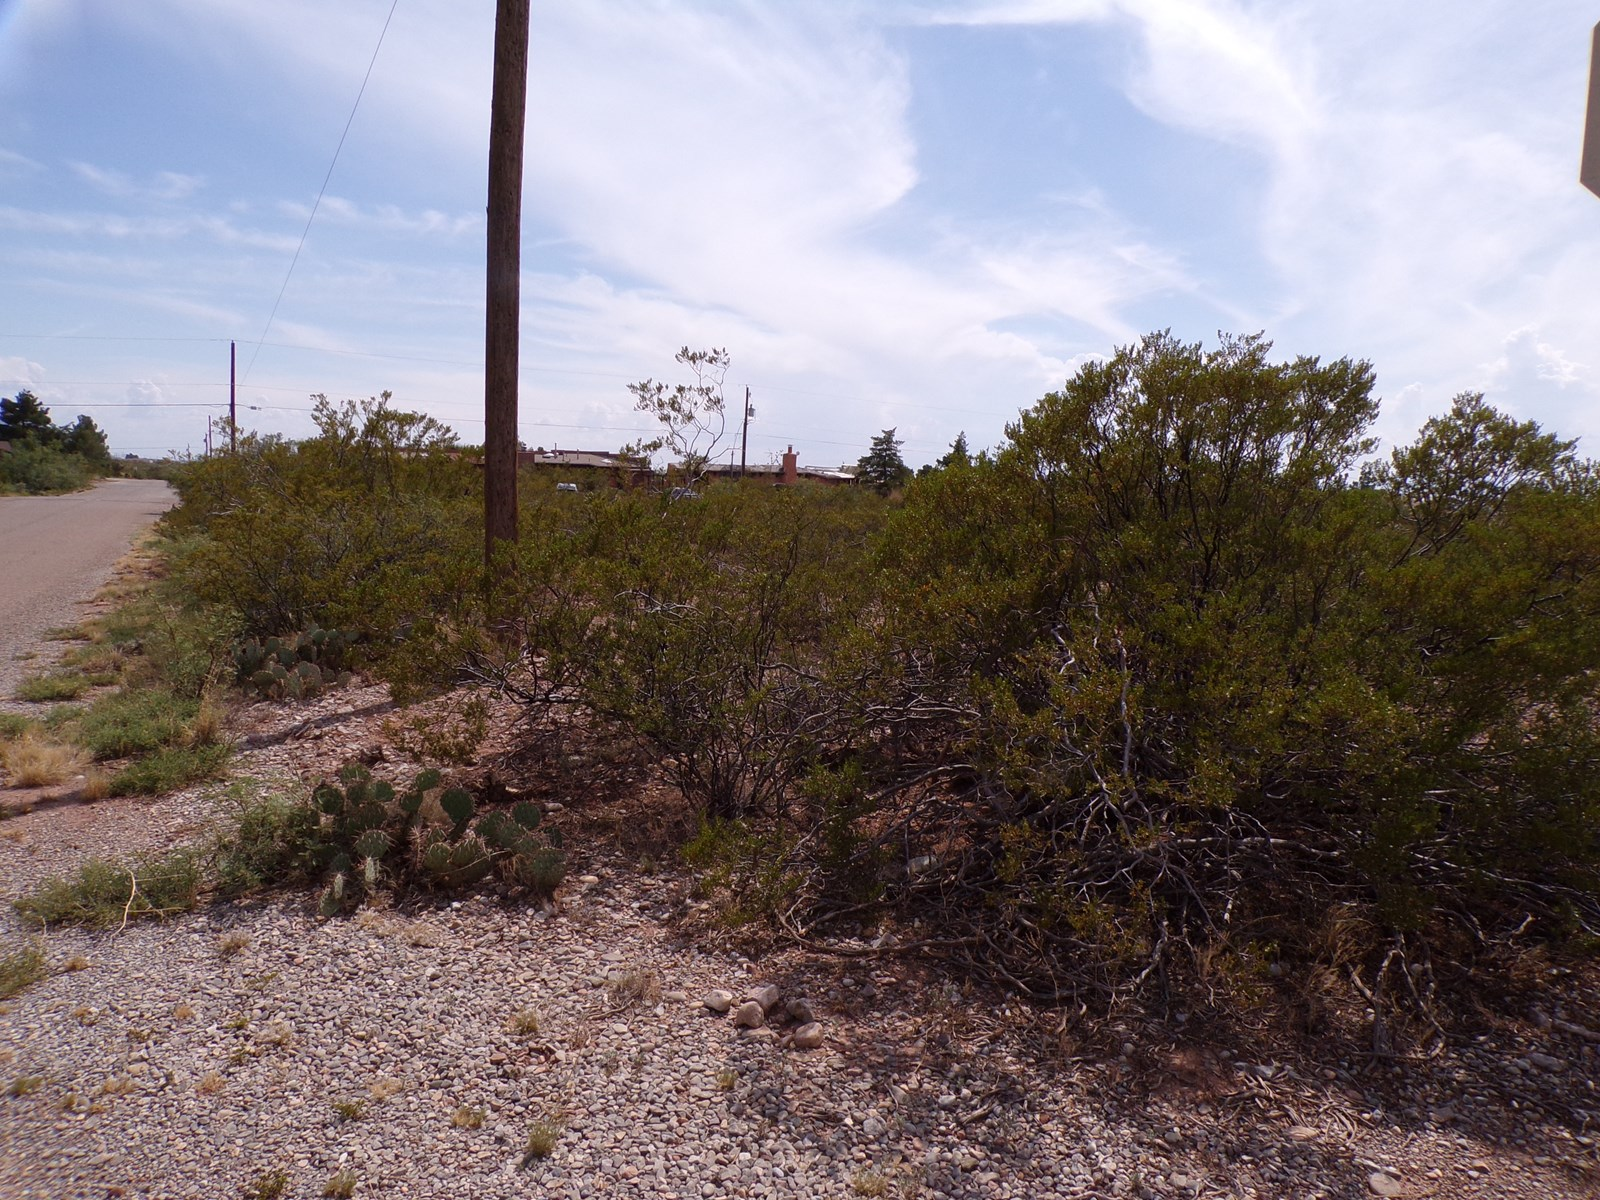 0.485 Acre Lot for Sale in La Luz, NM, Utilities at line